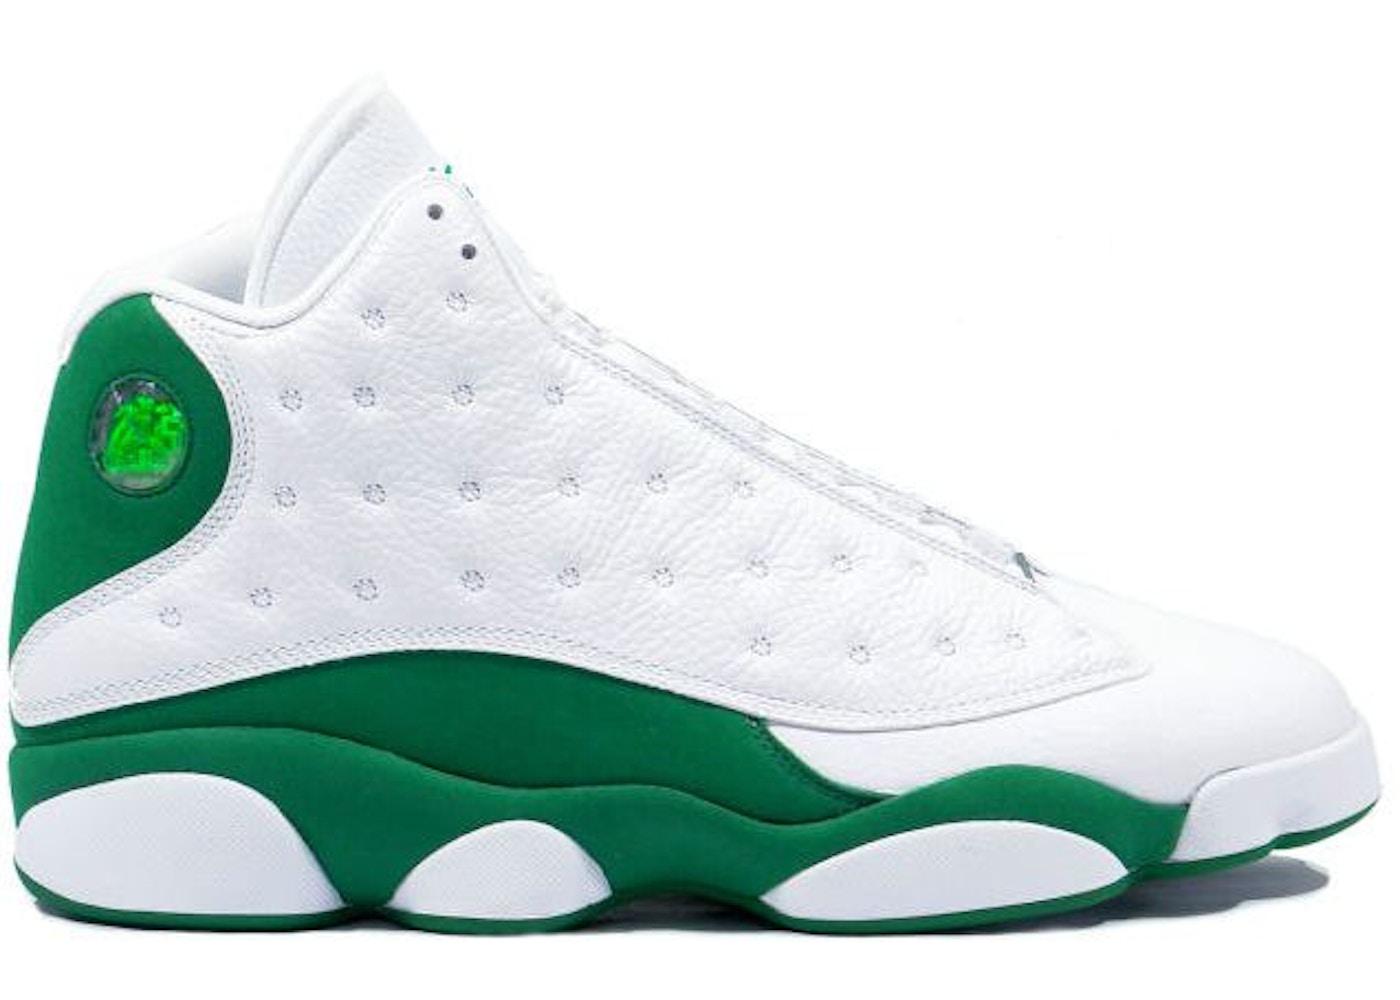 cheap for discount 76a50 0d9d5 Buy Air Jordan 13 Shoes & Deadstock Sneakers